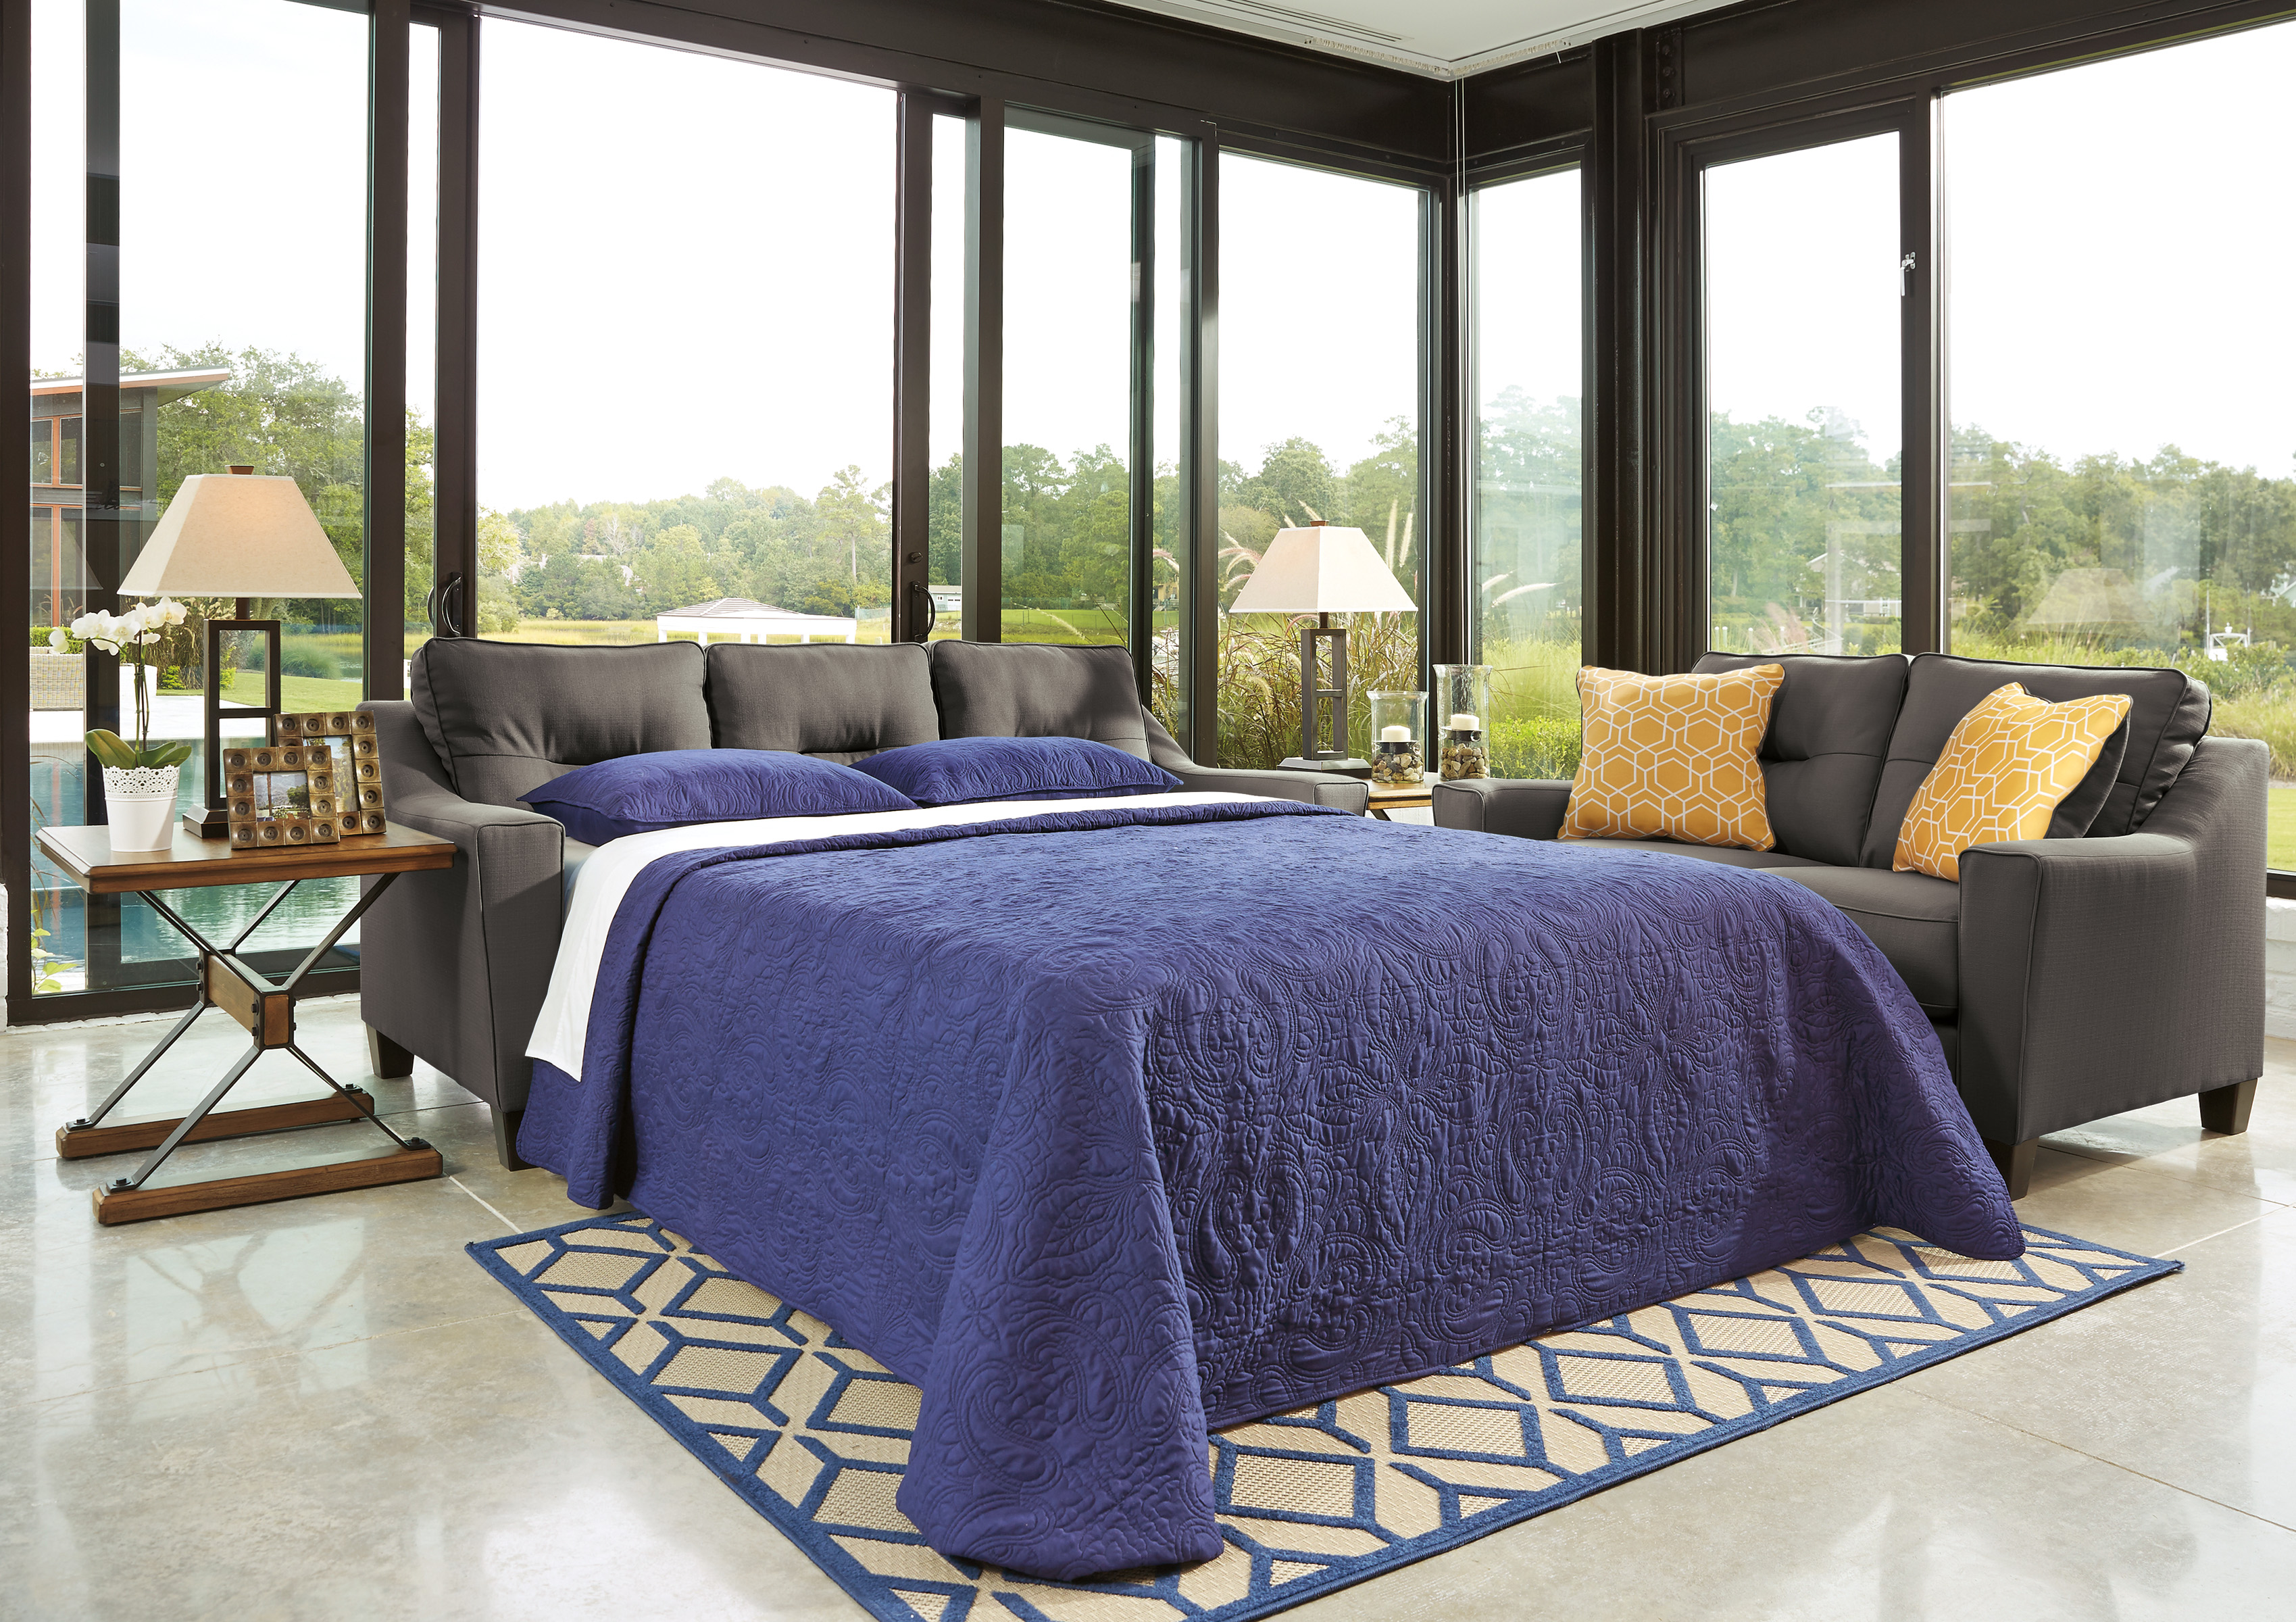 Forsan nuvella gray queen sofa sleeper memory foam mattress